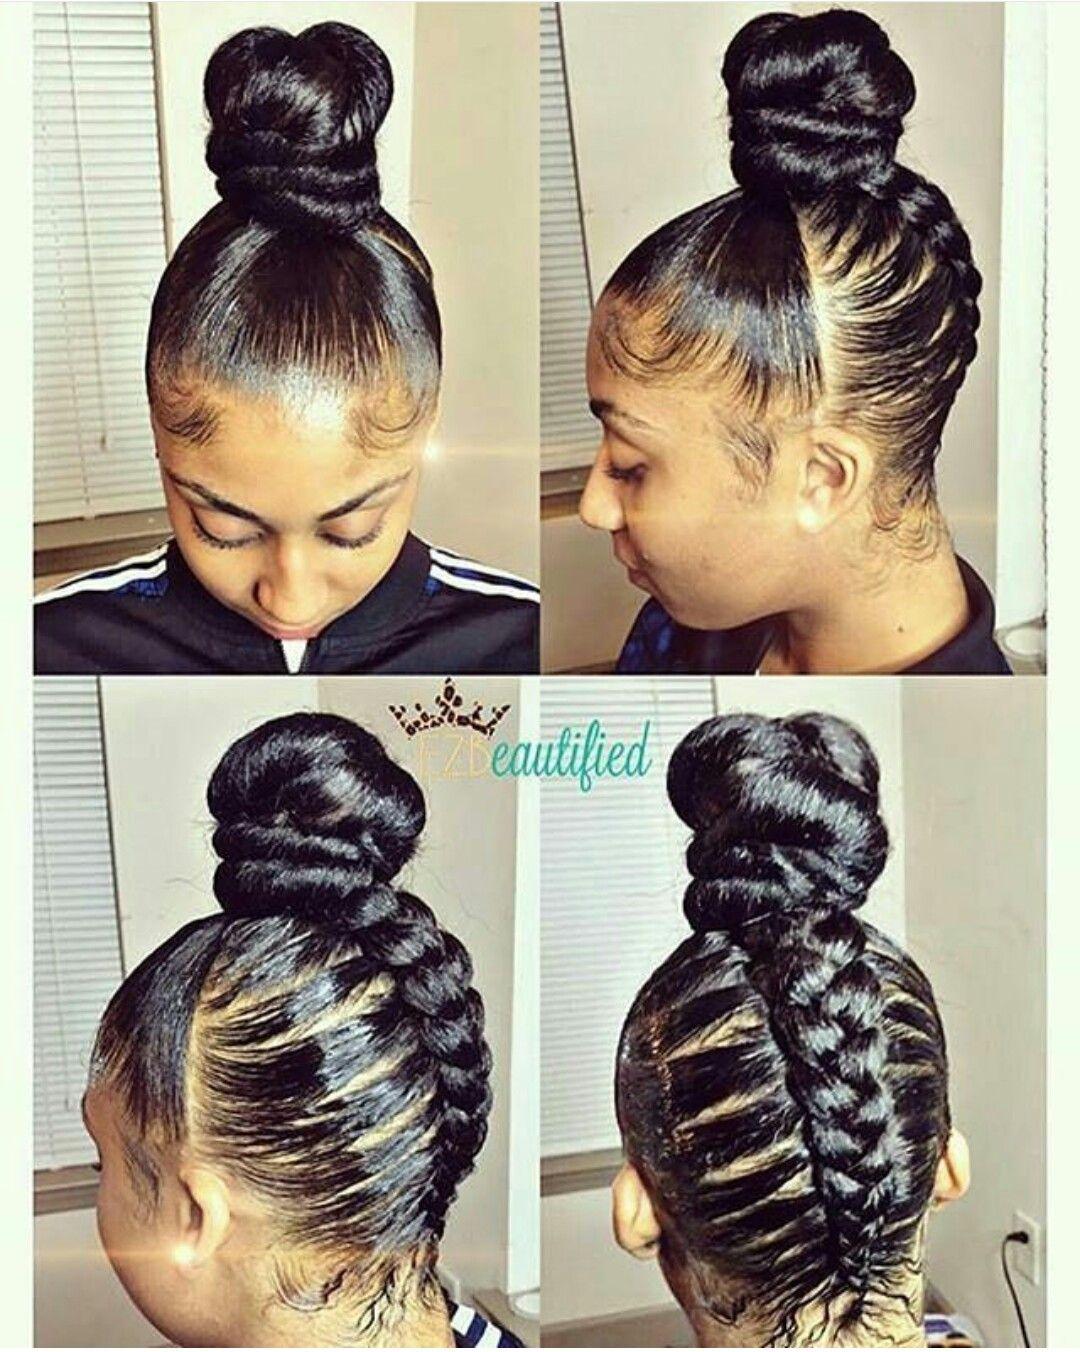 Sleek Top Knot Bun Using Kanekalon Hair My Style In 2019 Braided 30 Beautiful Ka Kanekalon Hairstyles Black Hair Updo Hairstyles Braided Bun Hairstyles